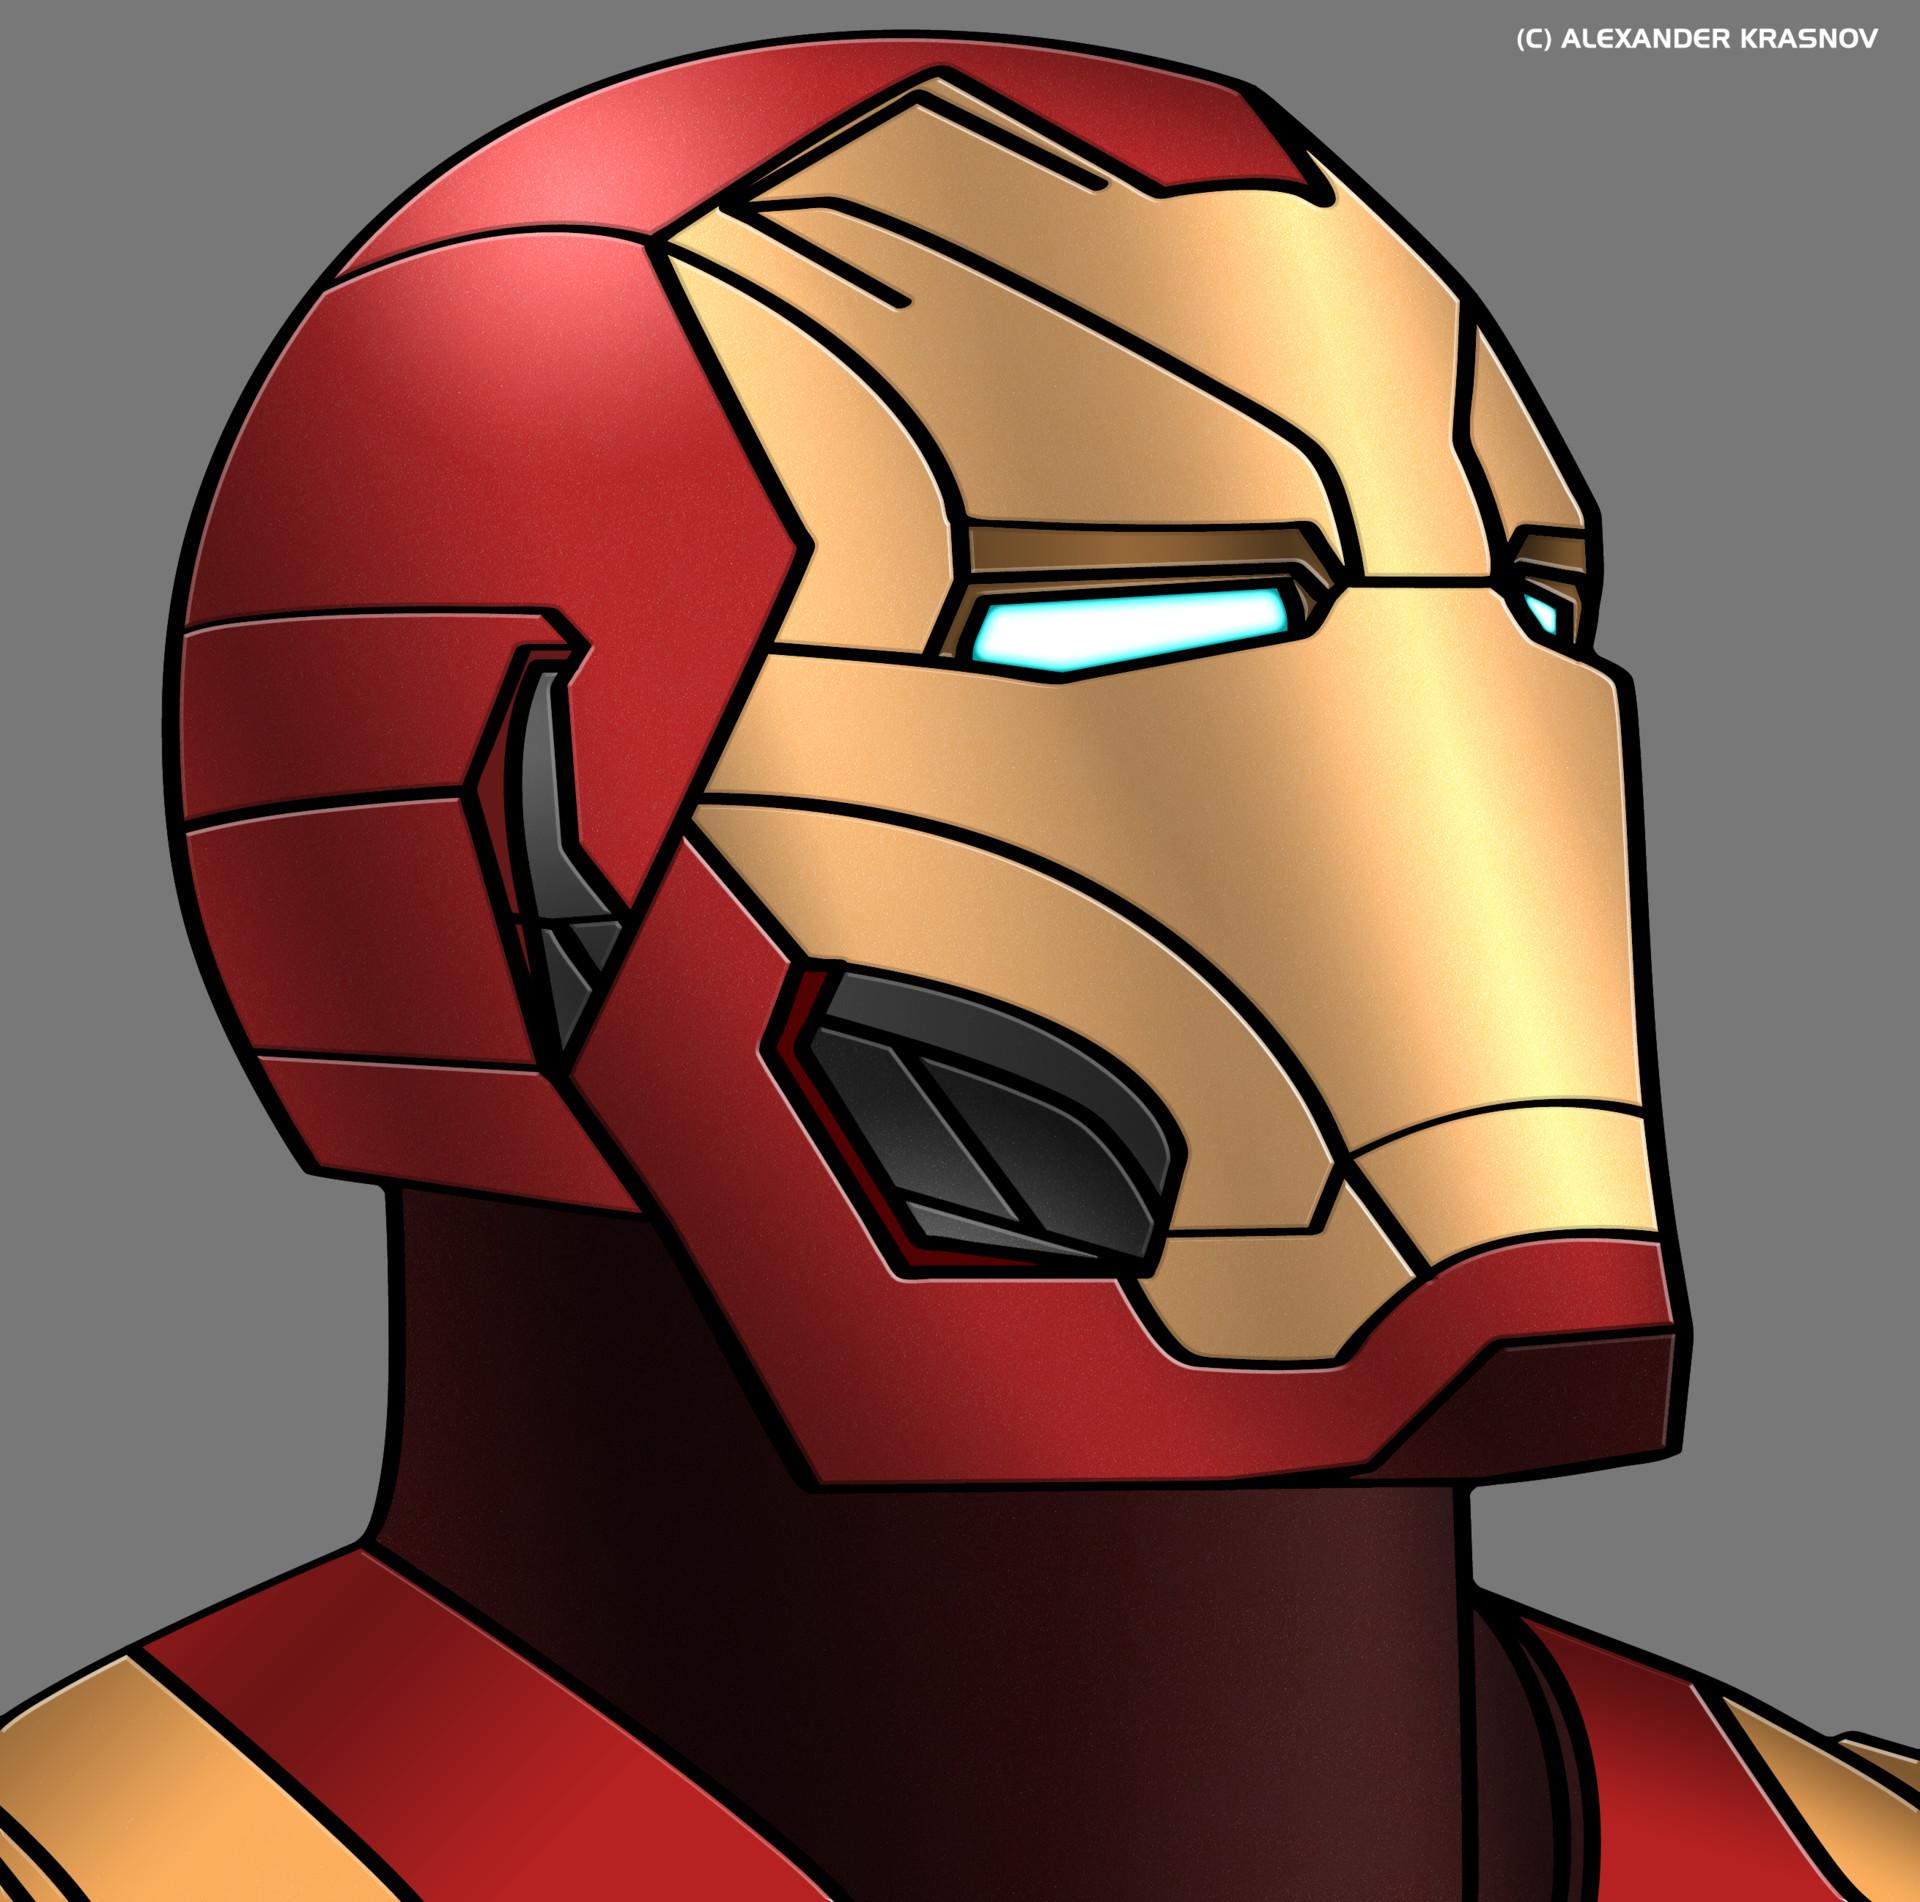 620 Koleksi Gambar Iron Man Vector Gratis Terbaik